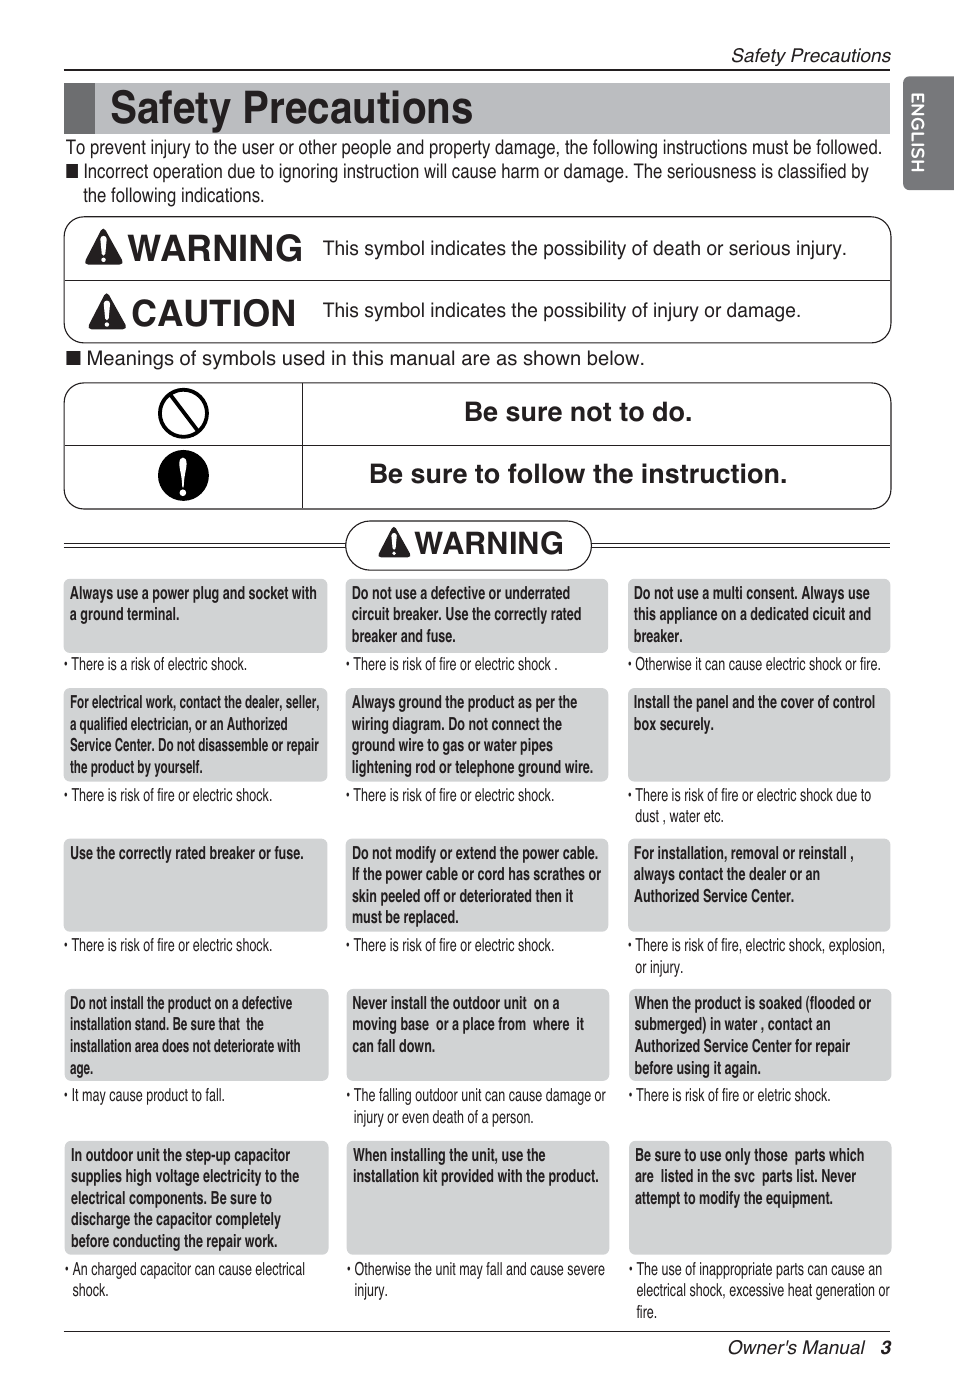 Safety precautions, Warning caution, Warning | LG MA09AH1 User ...